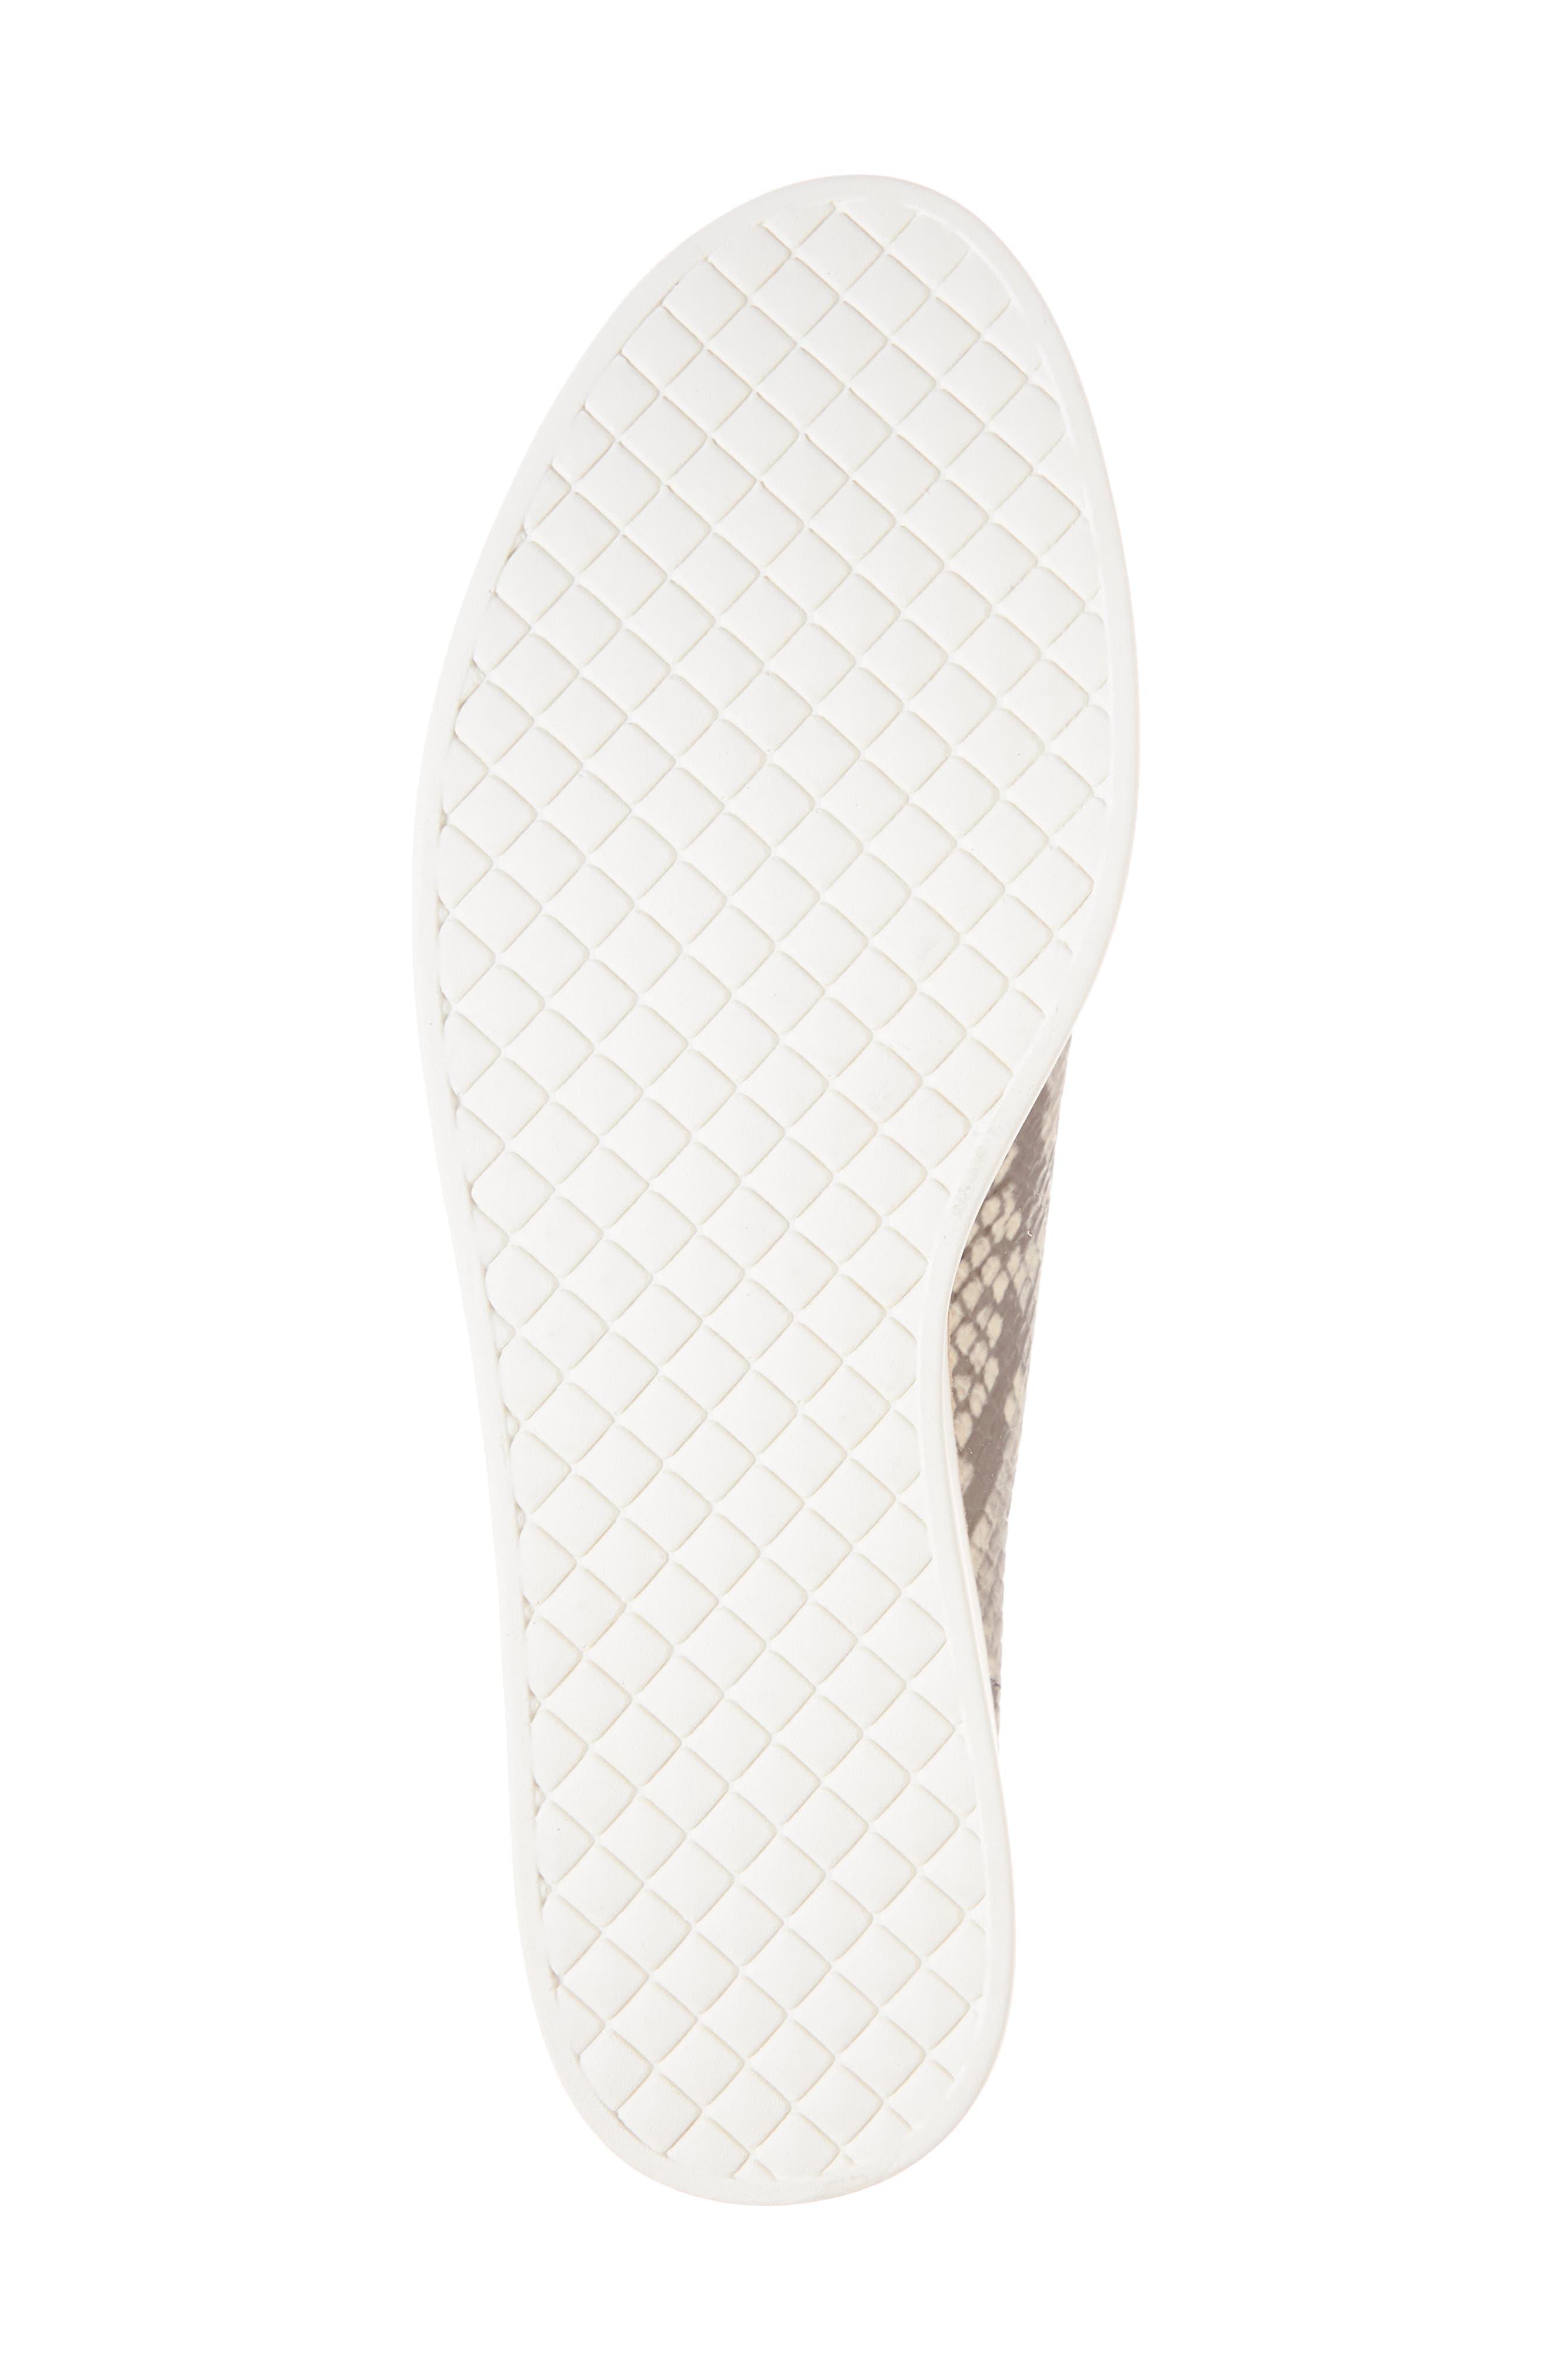 Kimber Wedge Platform Sneaker,                             Alternate thumbnail 6, color,                             Natural Snake Print